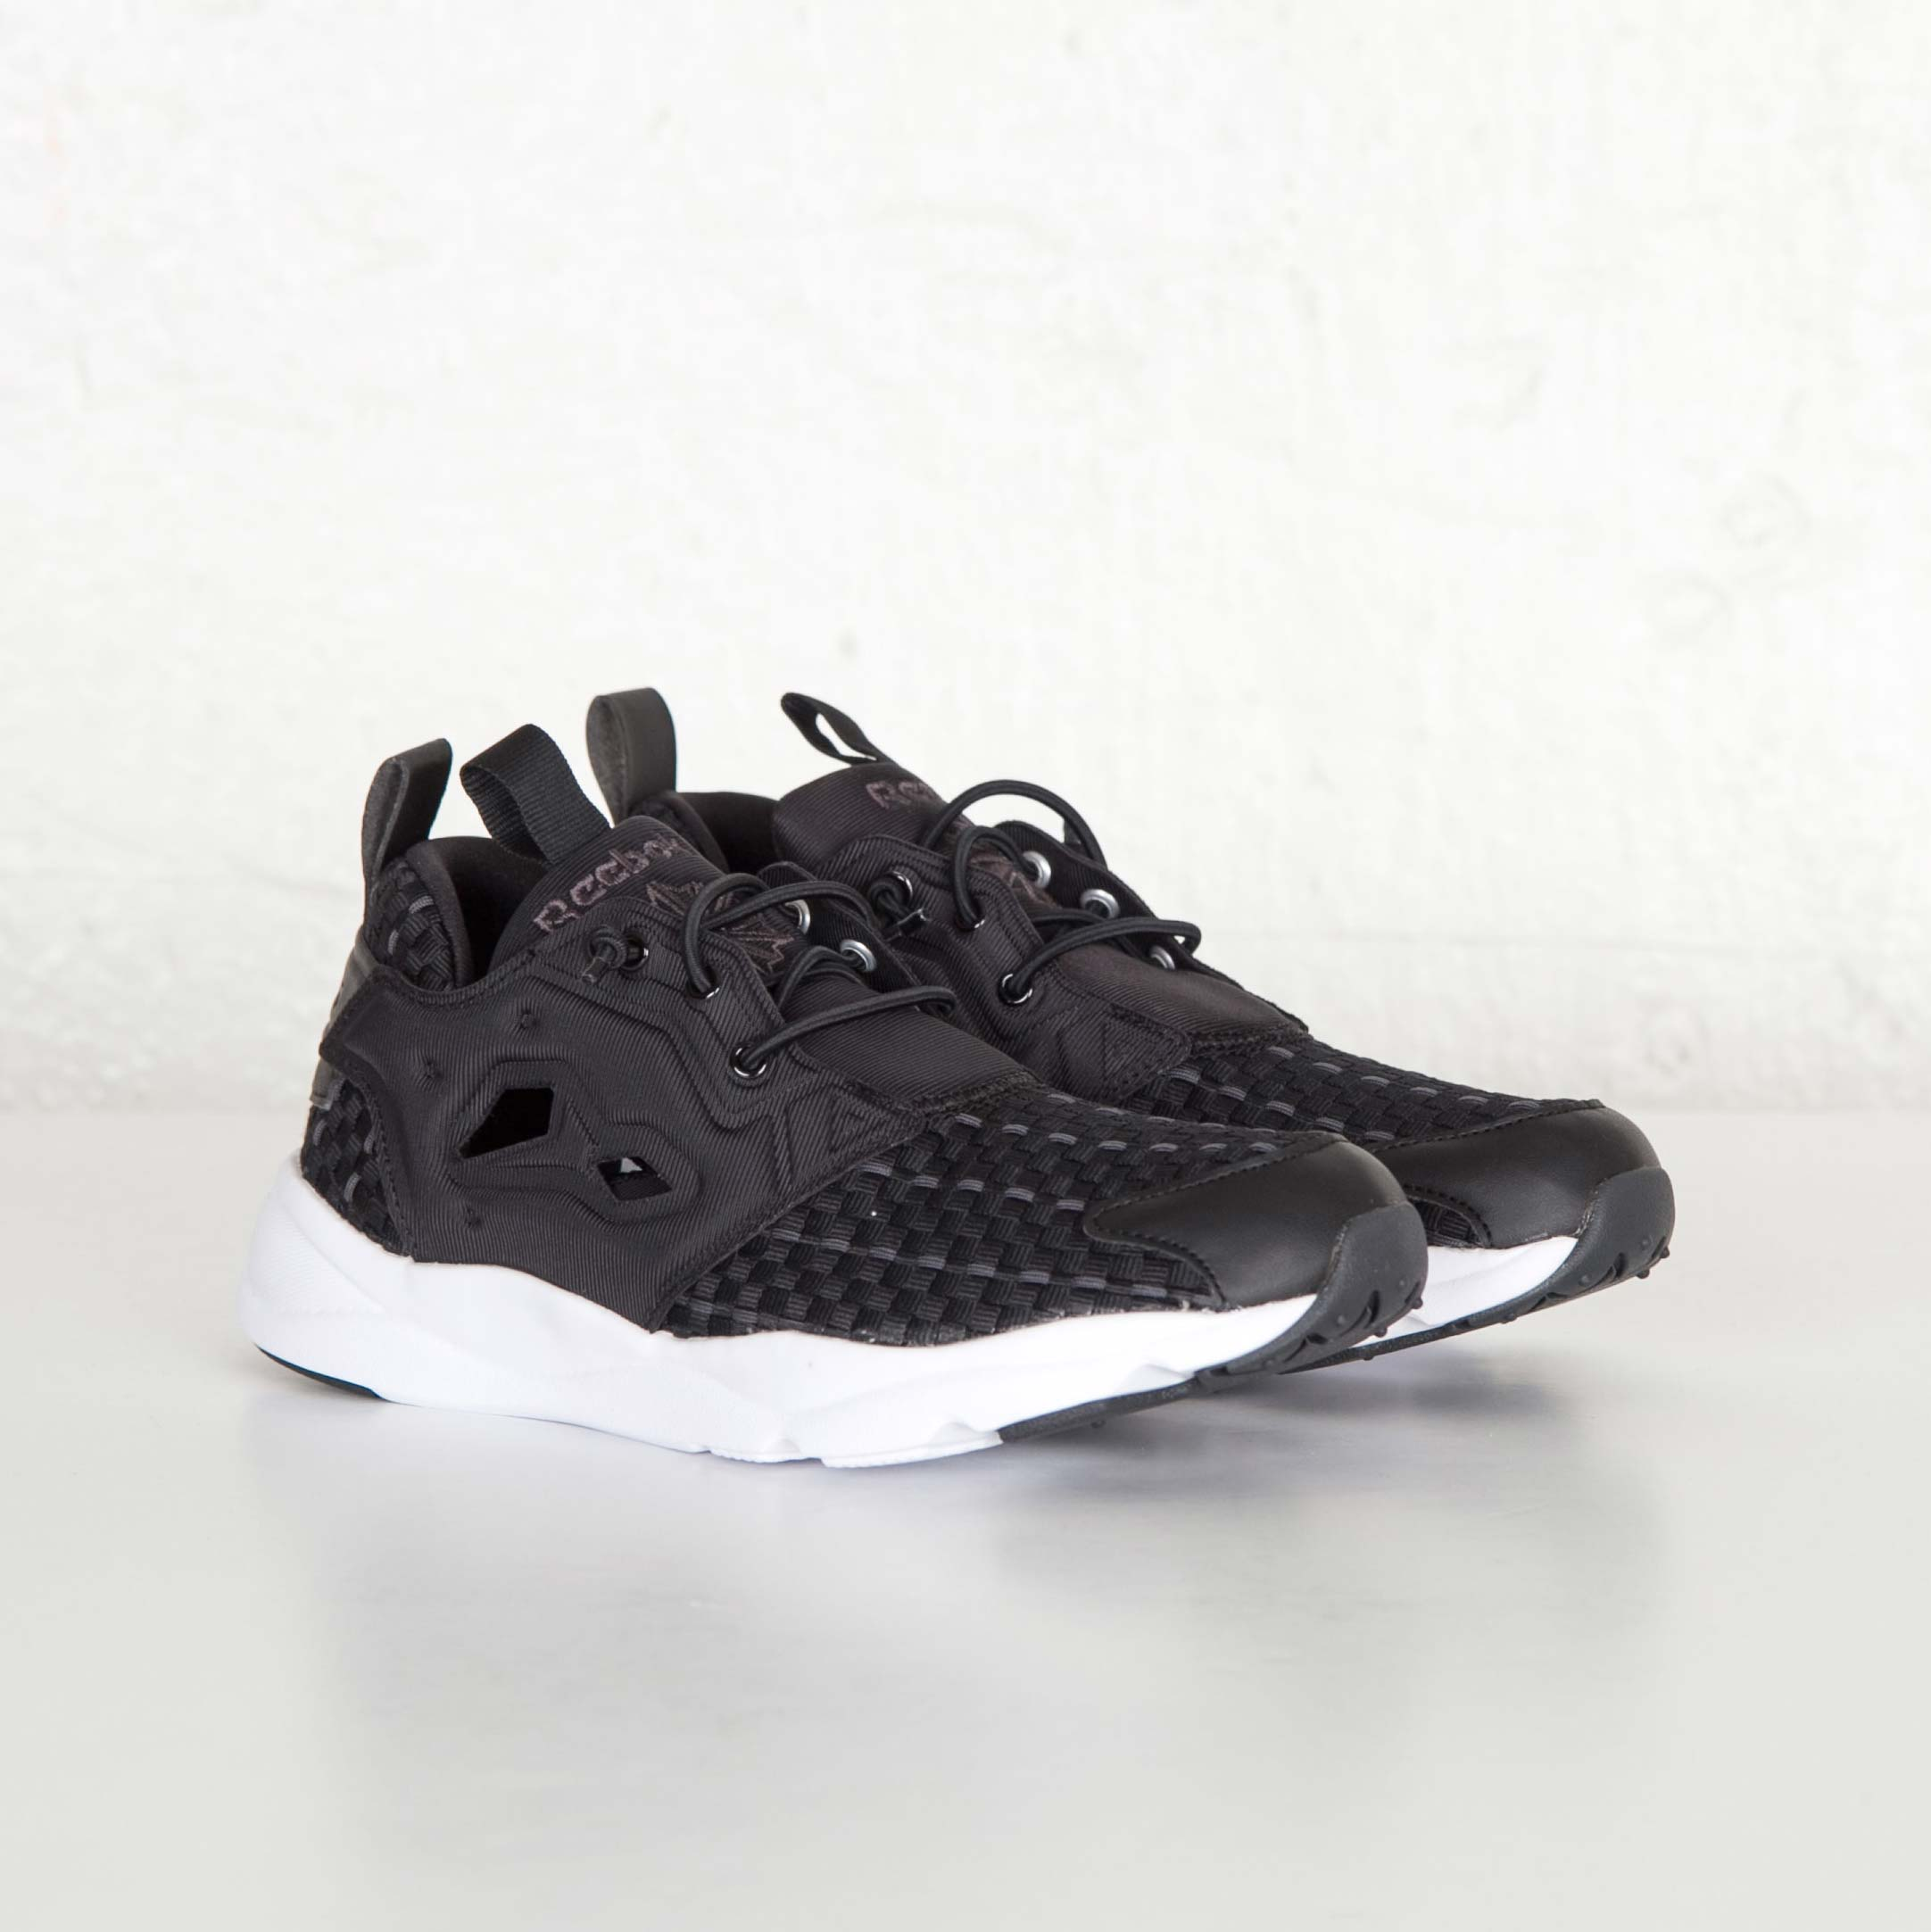 e02de401a877d0 Reebok Furylite New Woven - V70798 - Sneakersnstuff